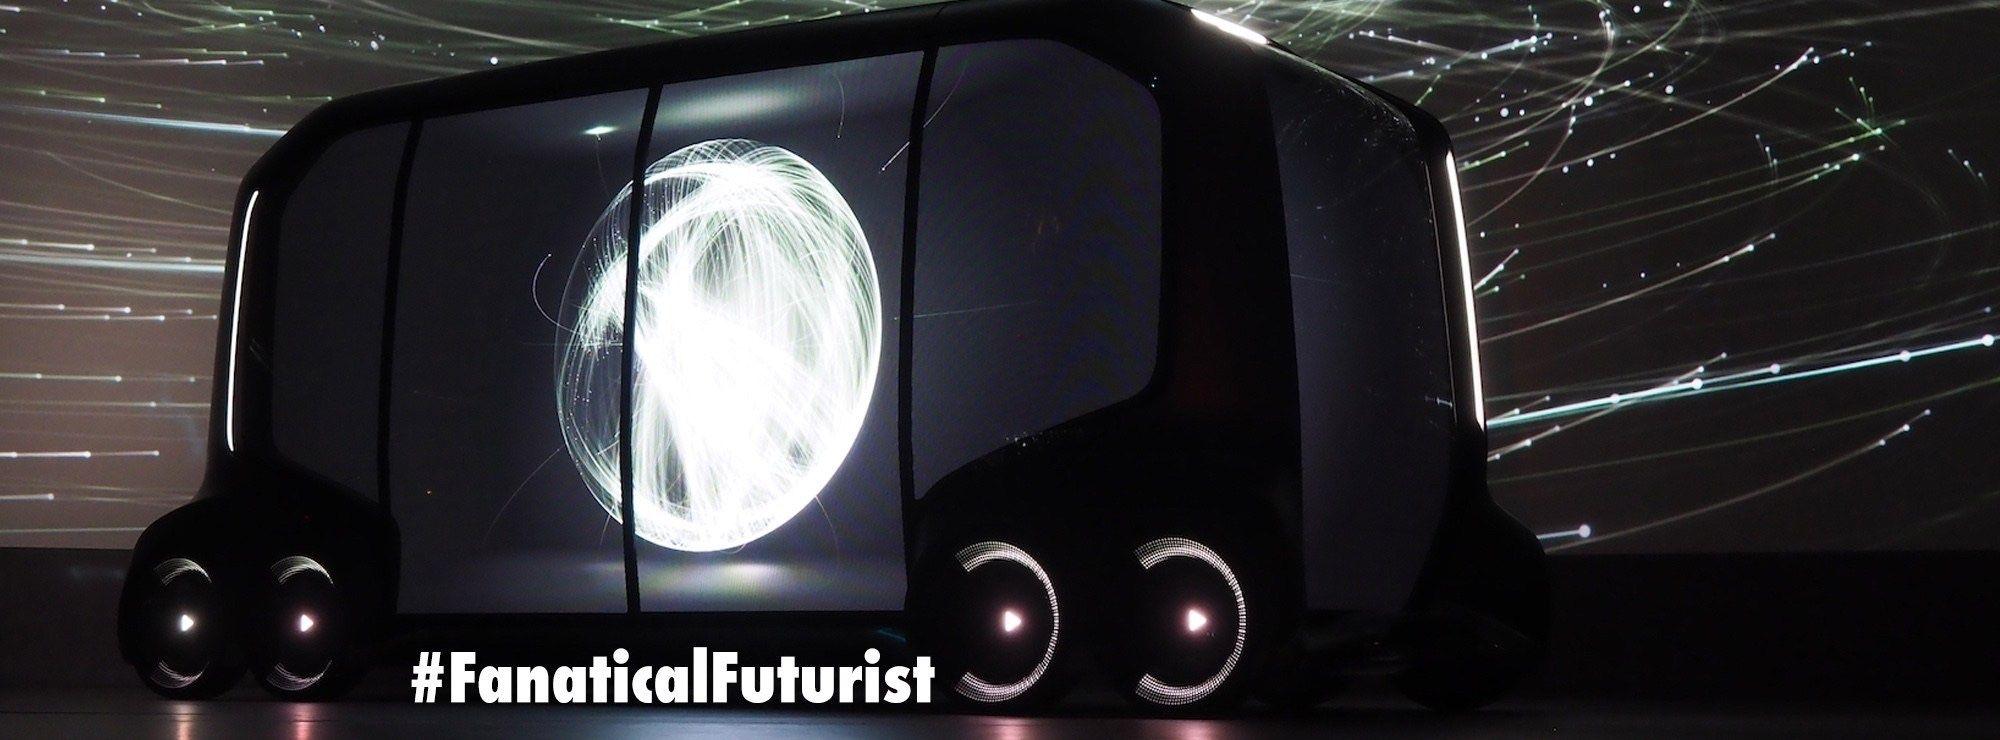 Toyota's autonomous vehicle concept signals the death of the car – By Matthew Griffin Futurist and Keynote Speaker  @Toyota #futurist #AutonomousVehicles